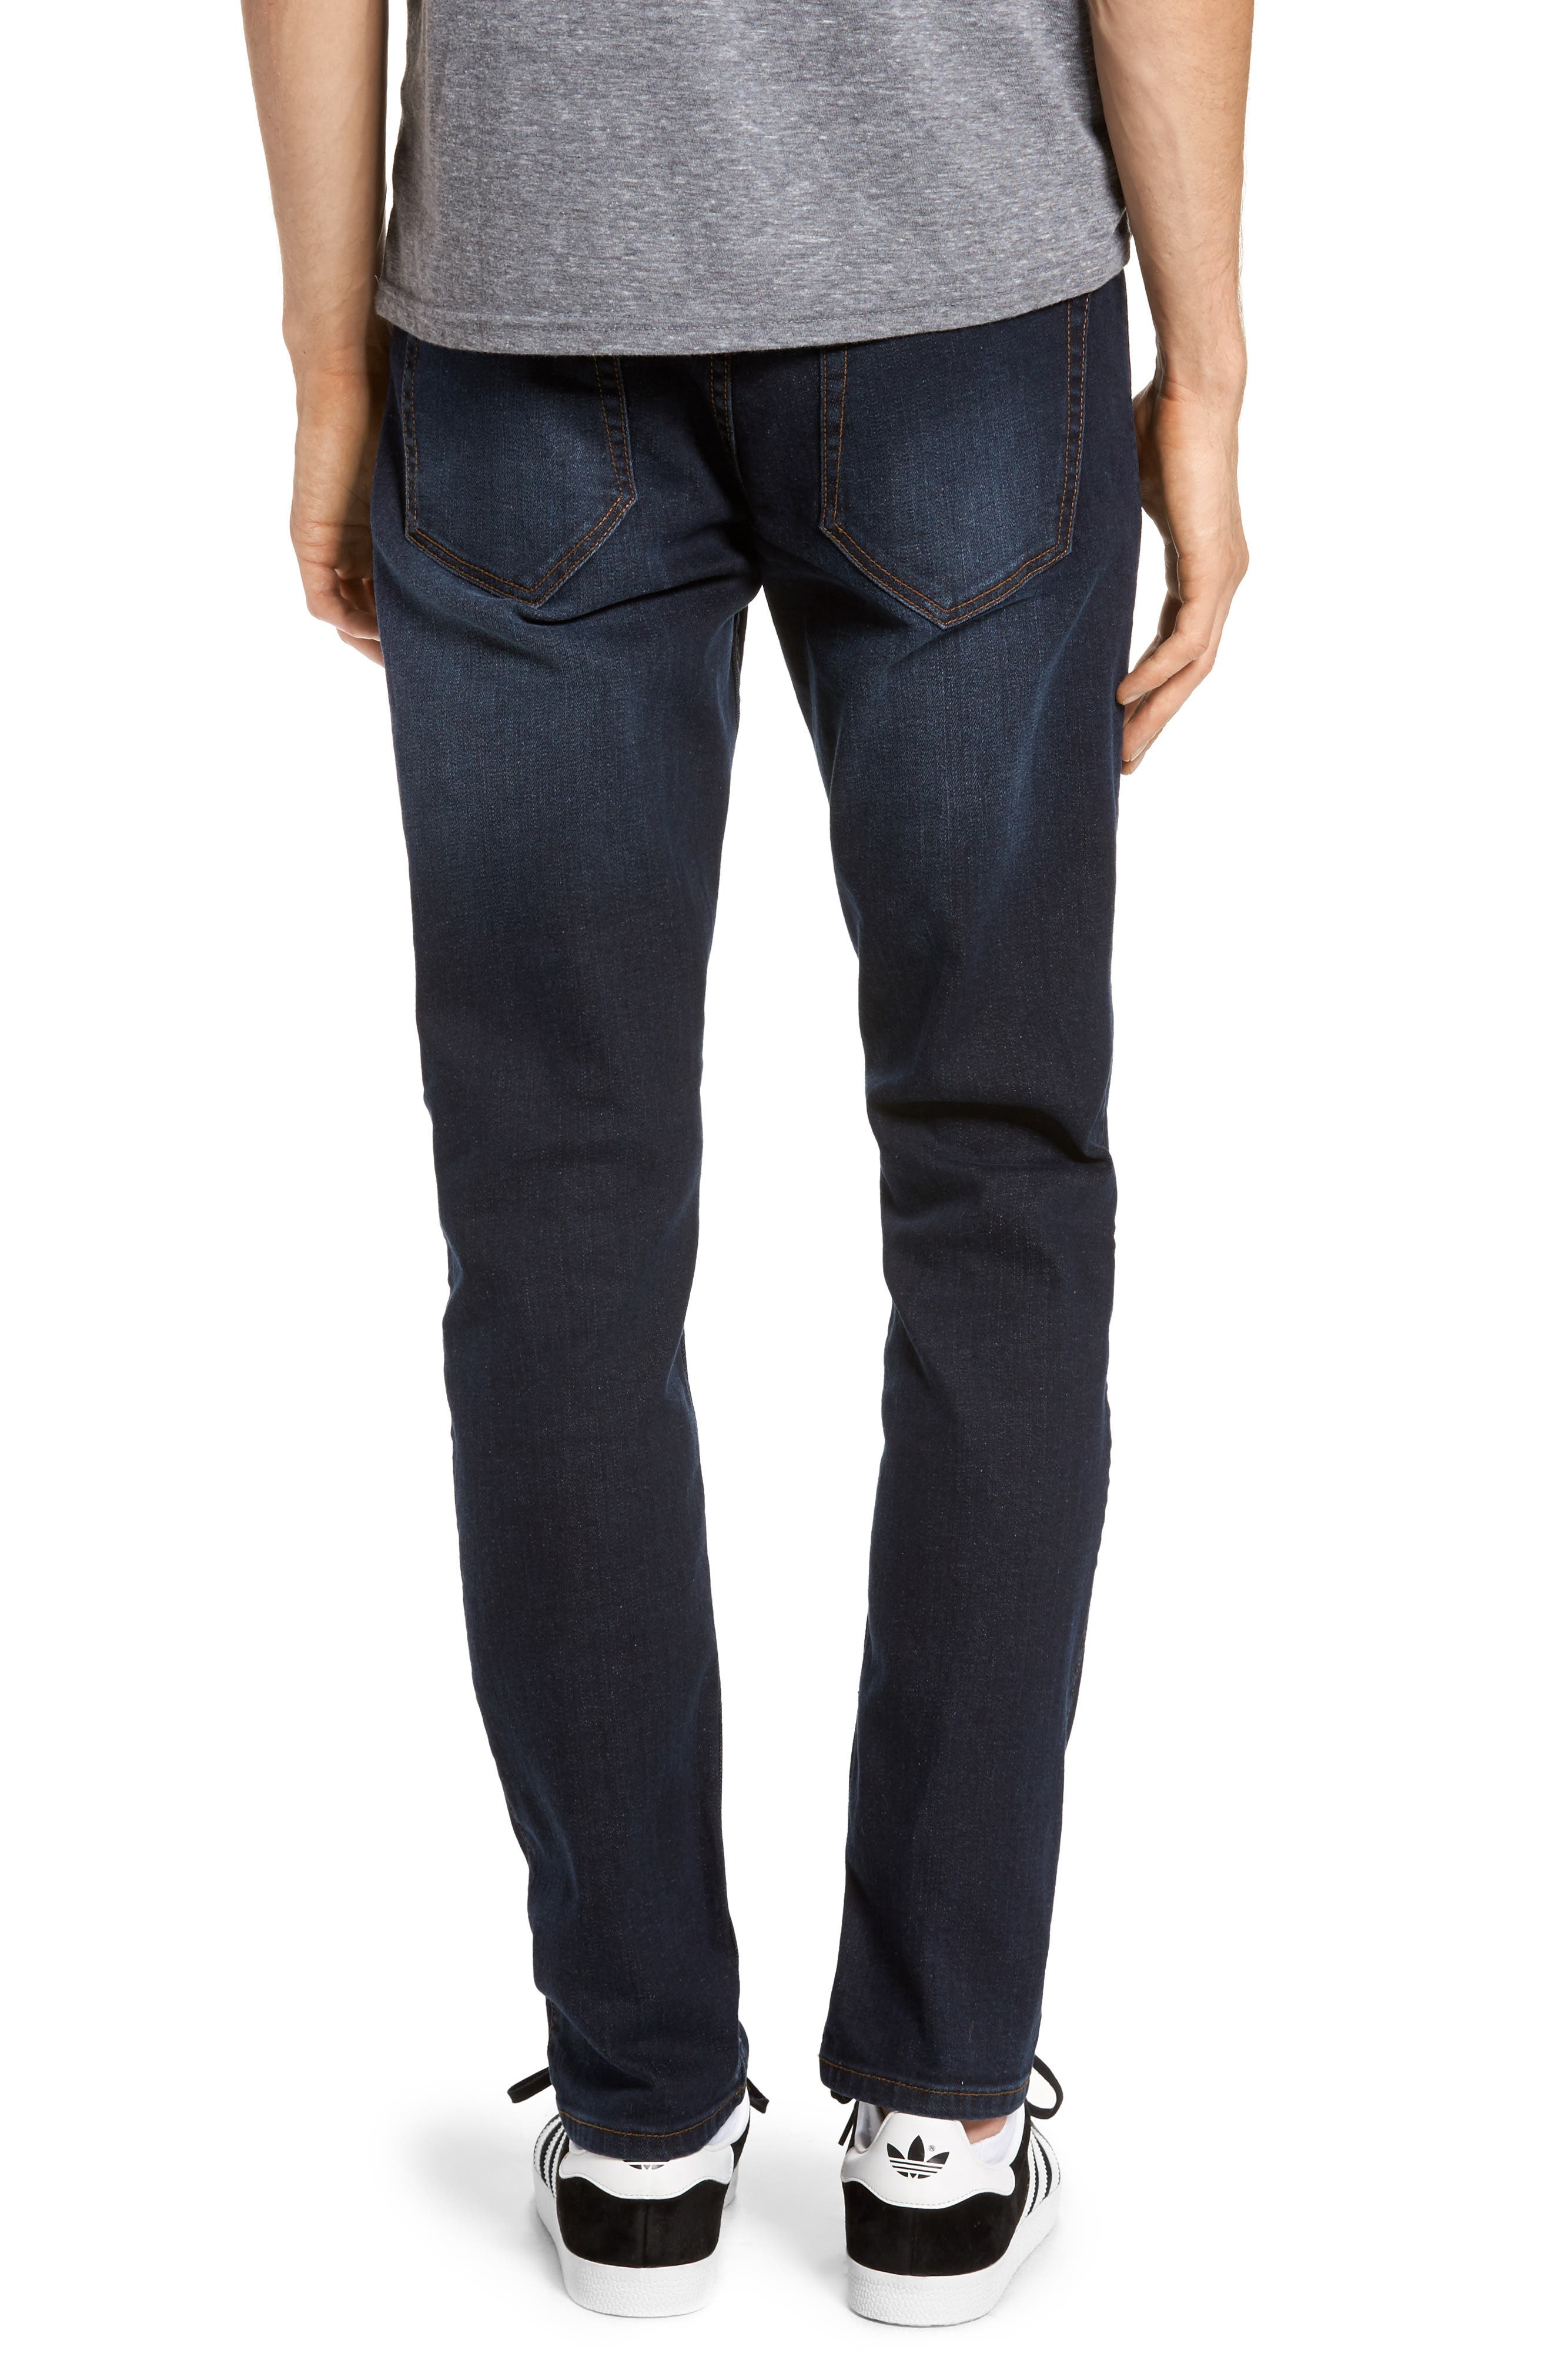 Clark Sim Straight Fit Jeans,                             Alternate thumbnail 2, color,                             Worn Dark Blue